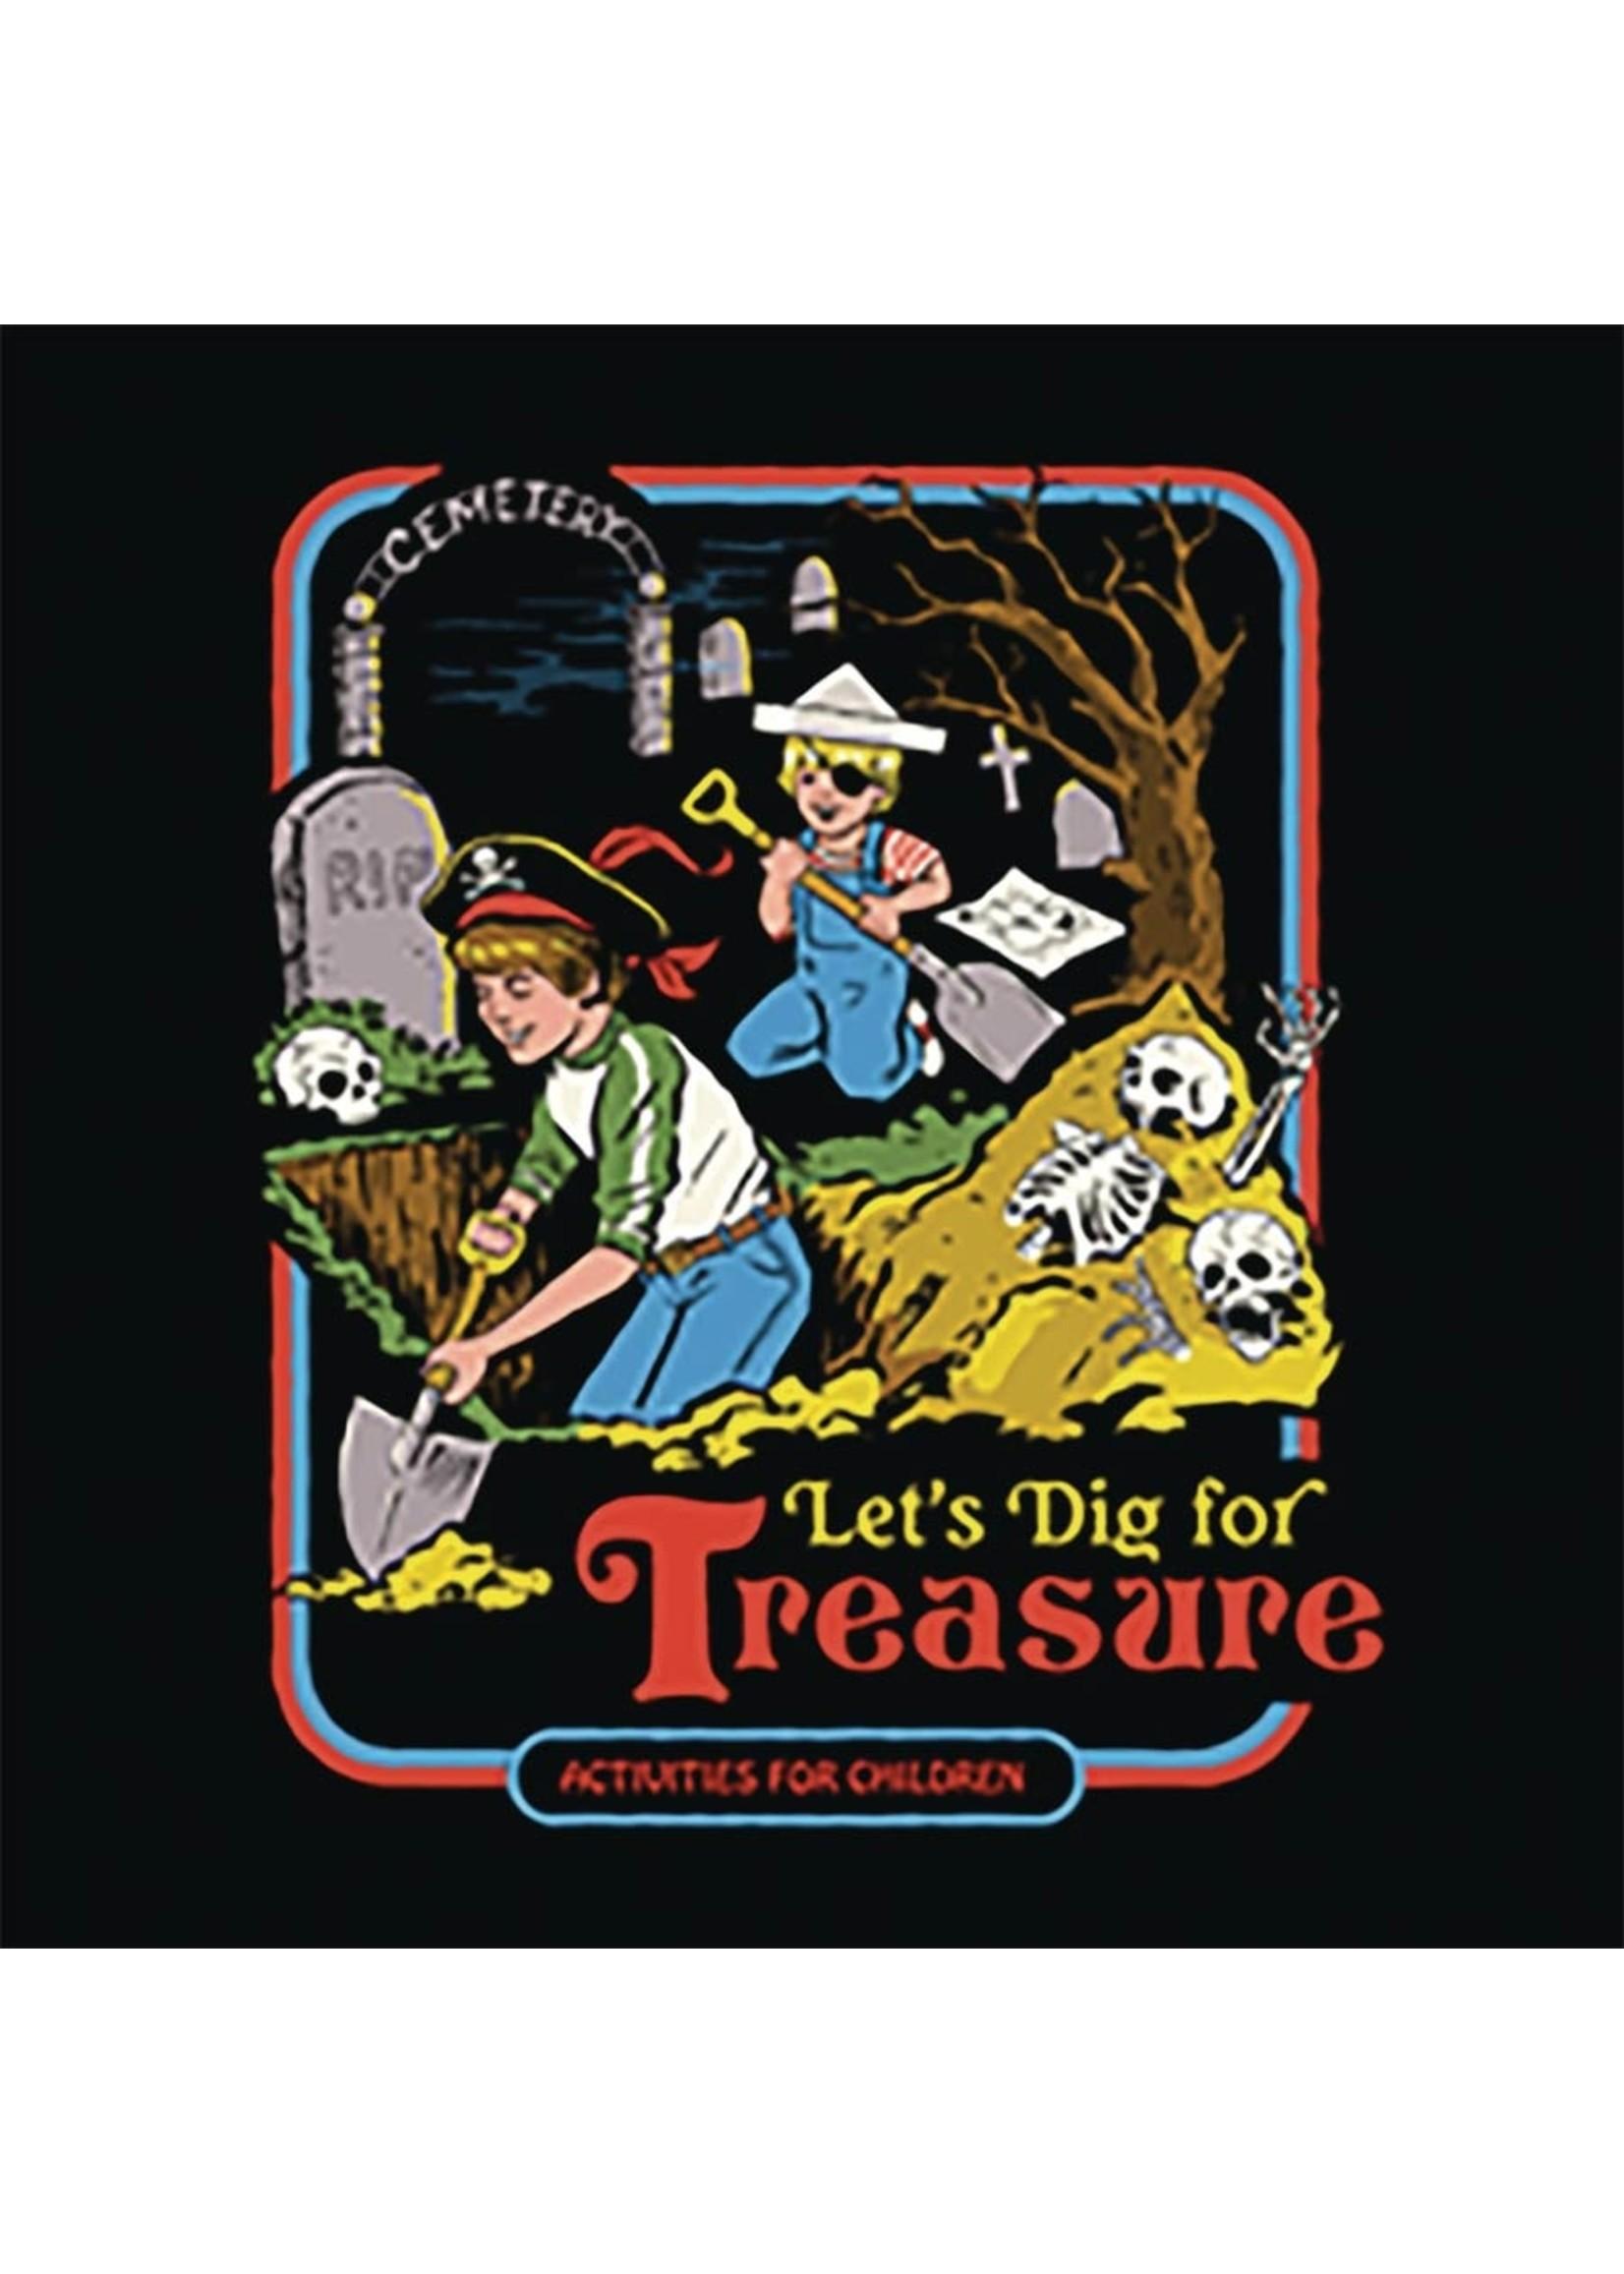 Let's Dig for Treaure - Steven Rhodes Collection